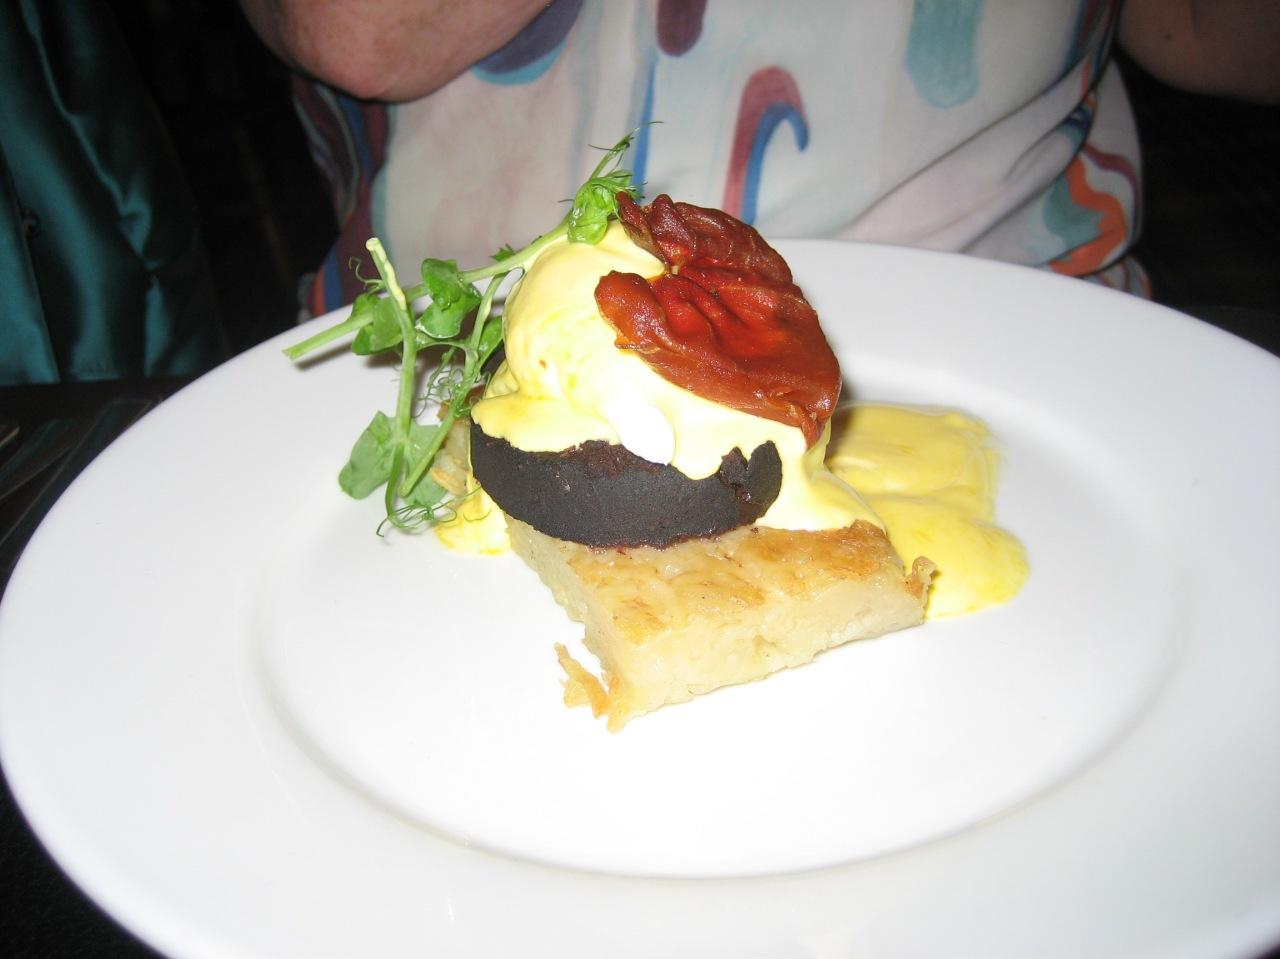 the-countryman-crisp-potato-rosti-black-pudding-poached-egg-with-hollandaise-and-parma-ham-002_36846750992_o